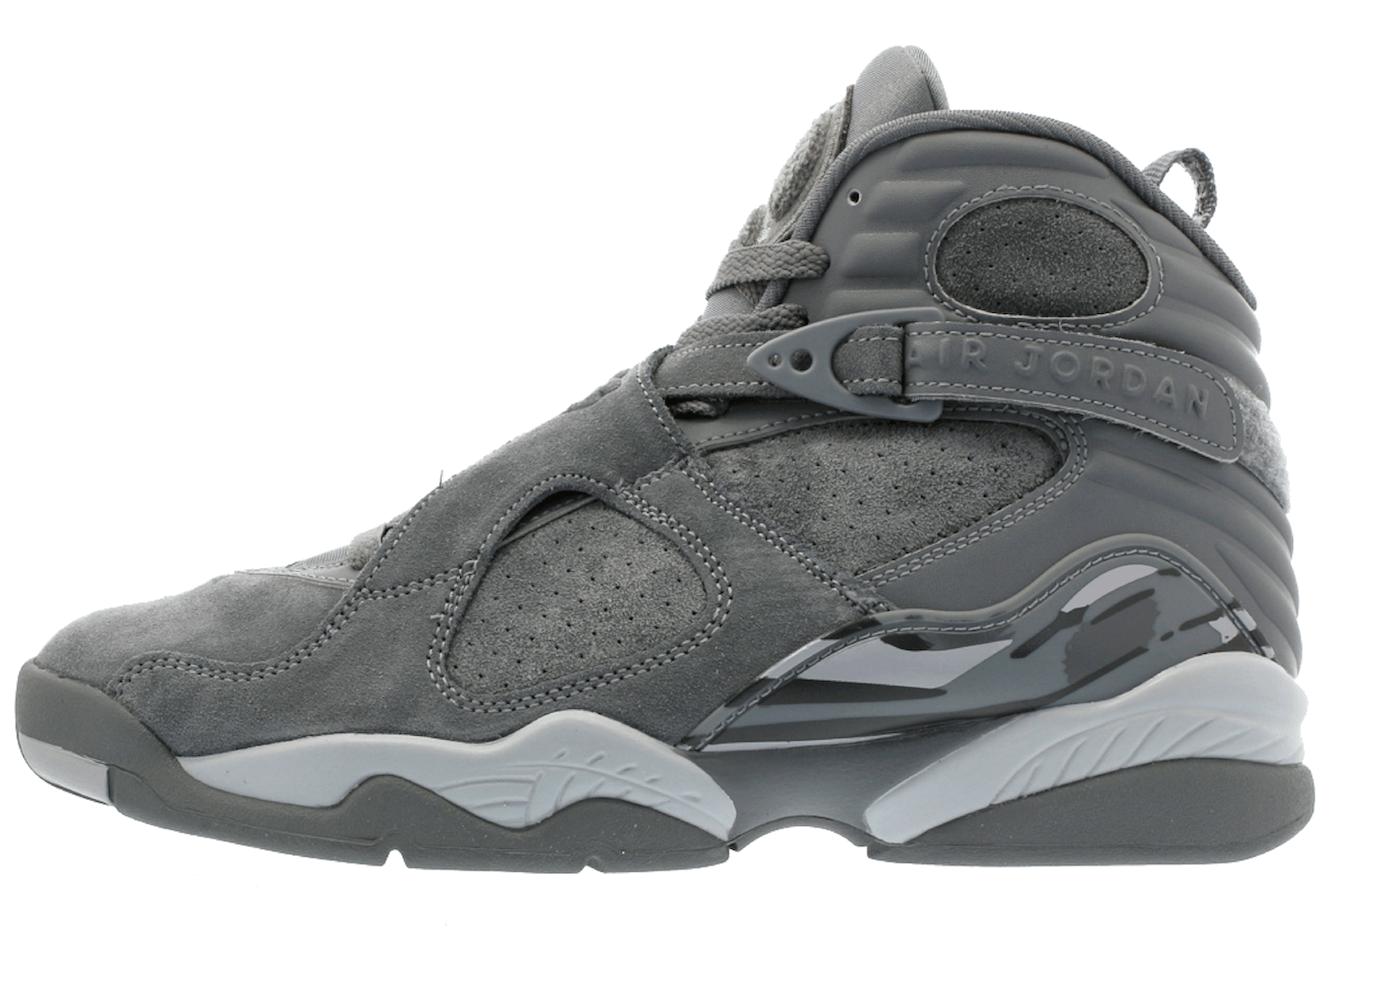 Jordan 8 Retro Cool Greyの写真